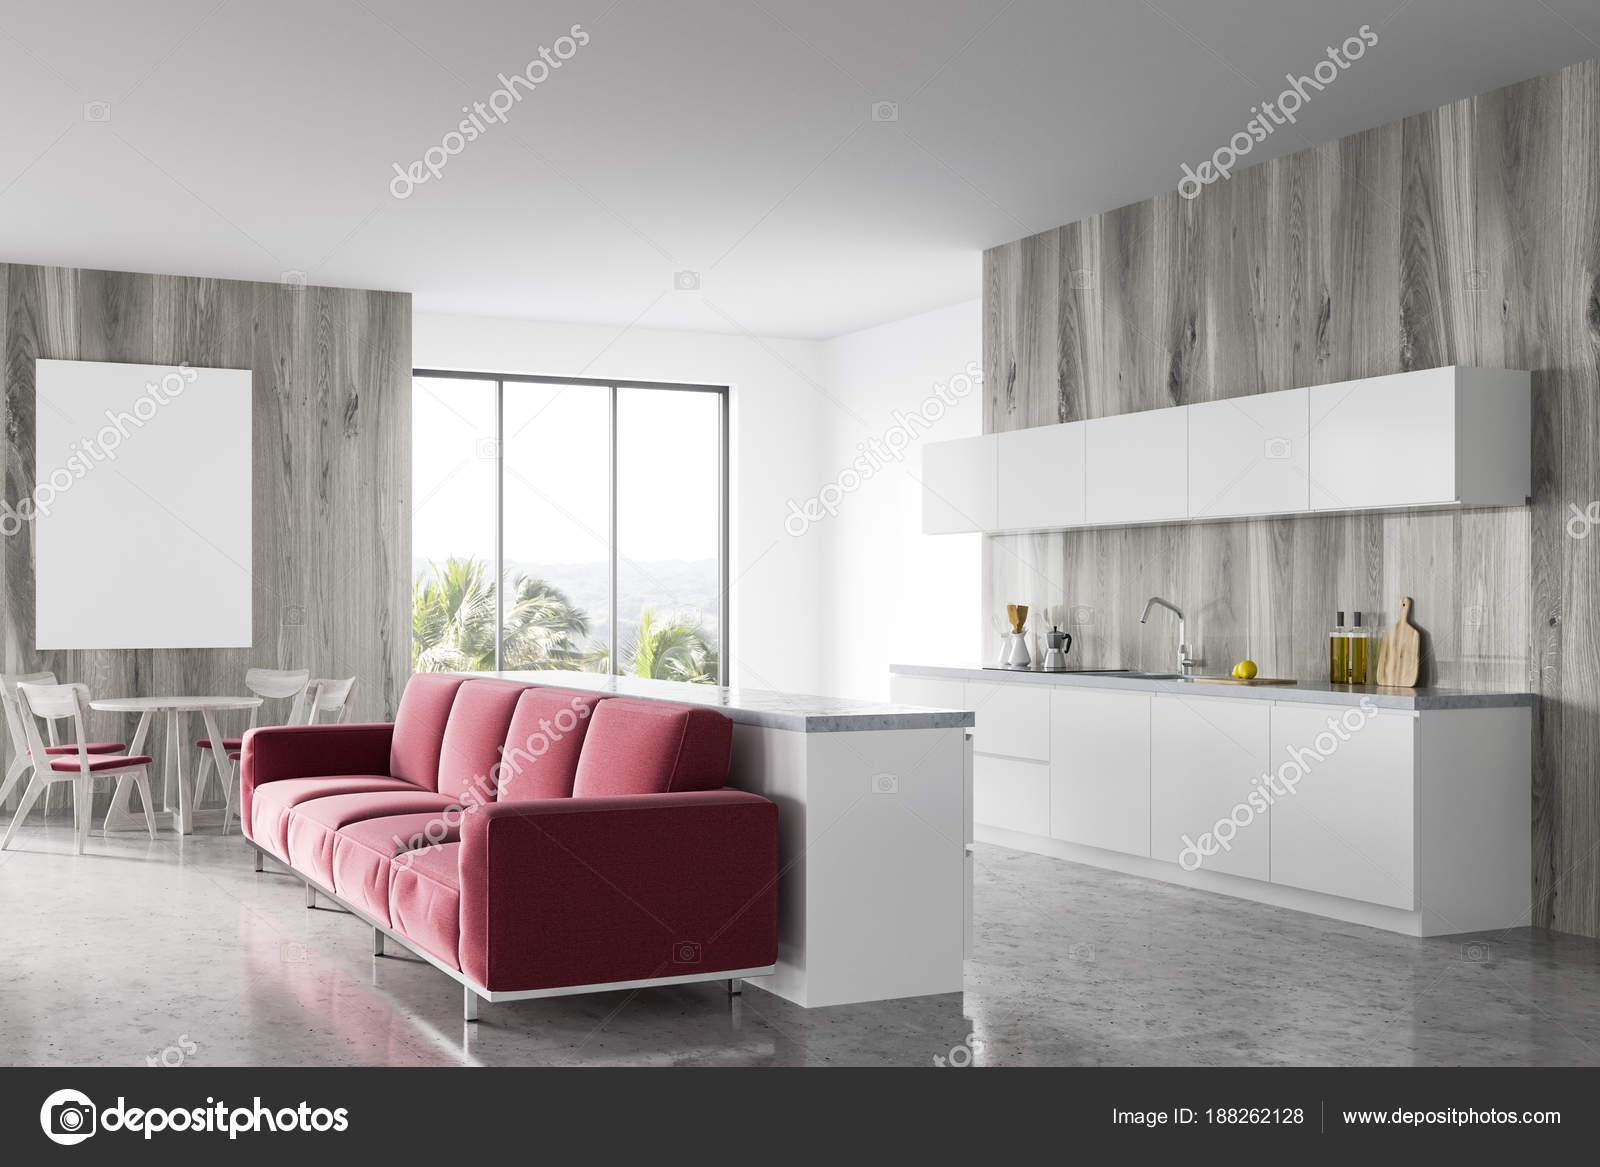 Wooden Esszimmer Rotes Sofa Plakat Stockfoto C Denisismagilov